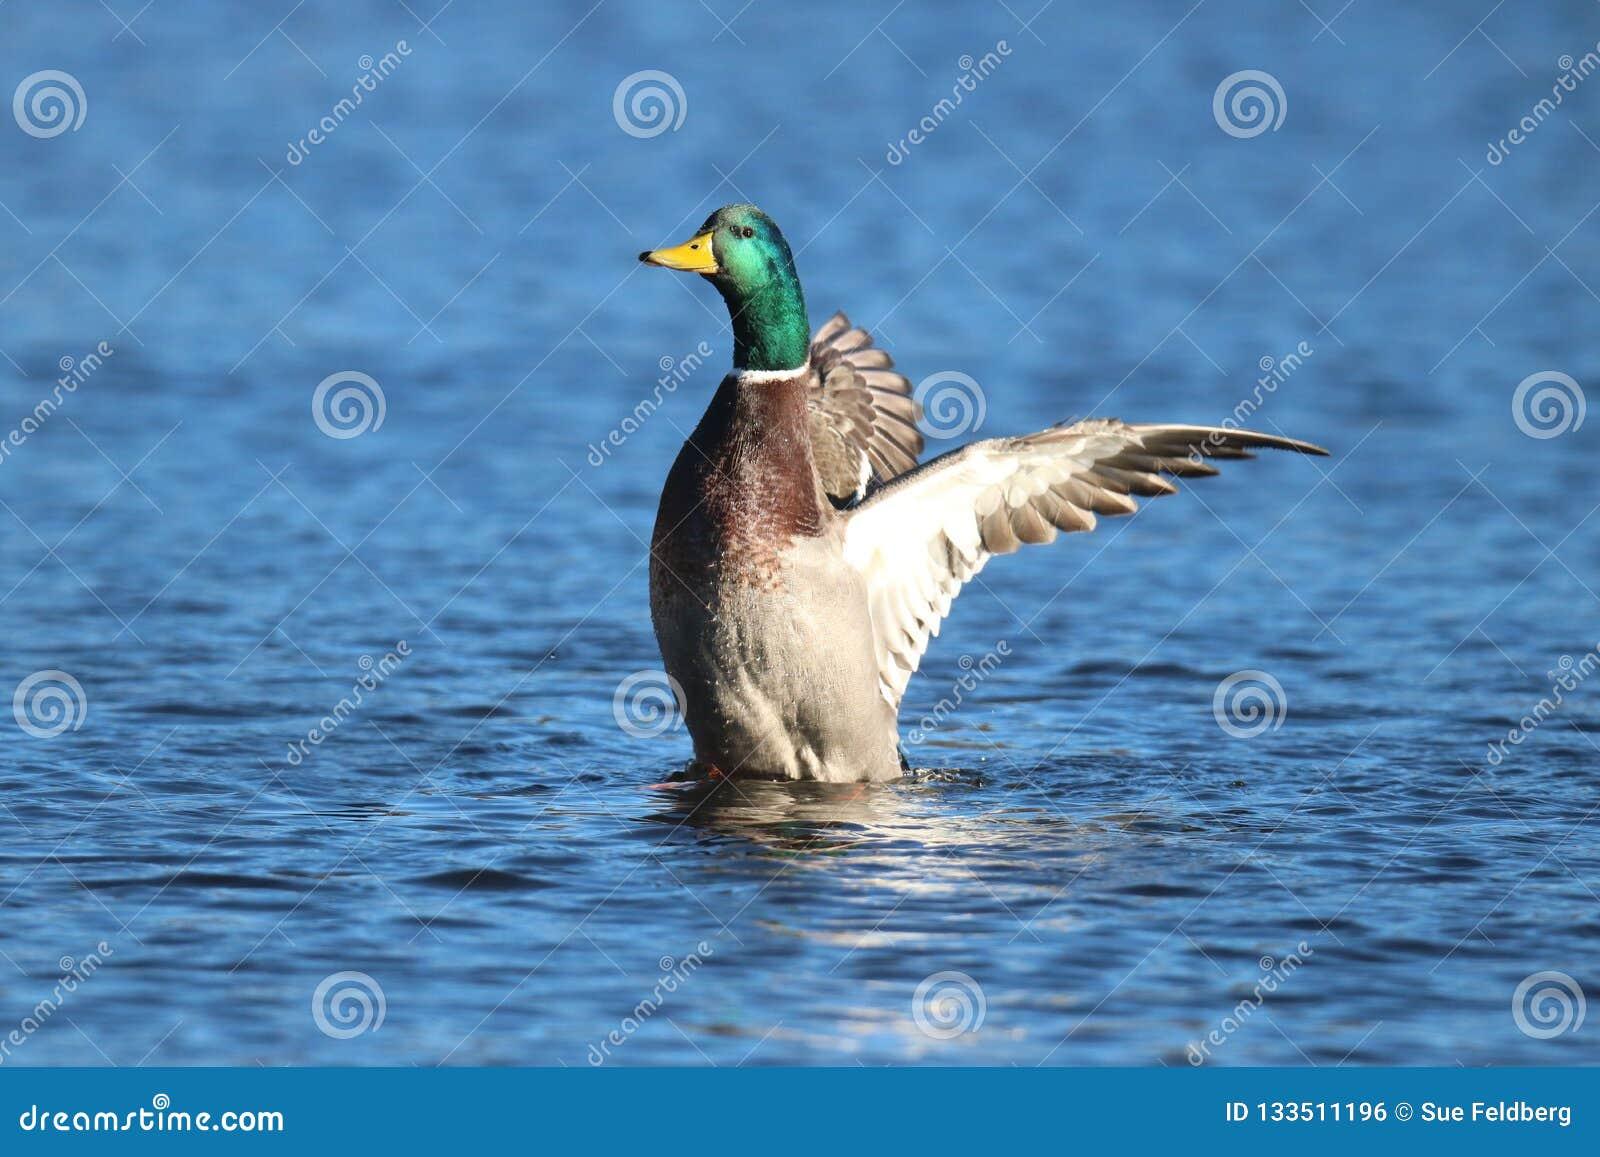 Mallard Duck on the Winter Lake